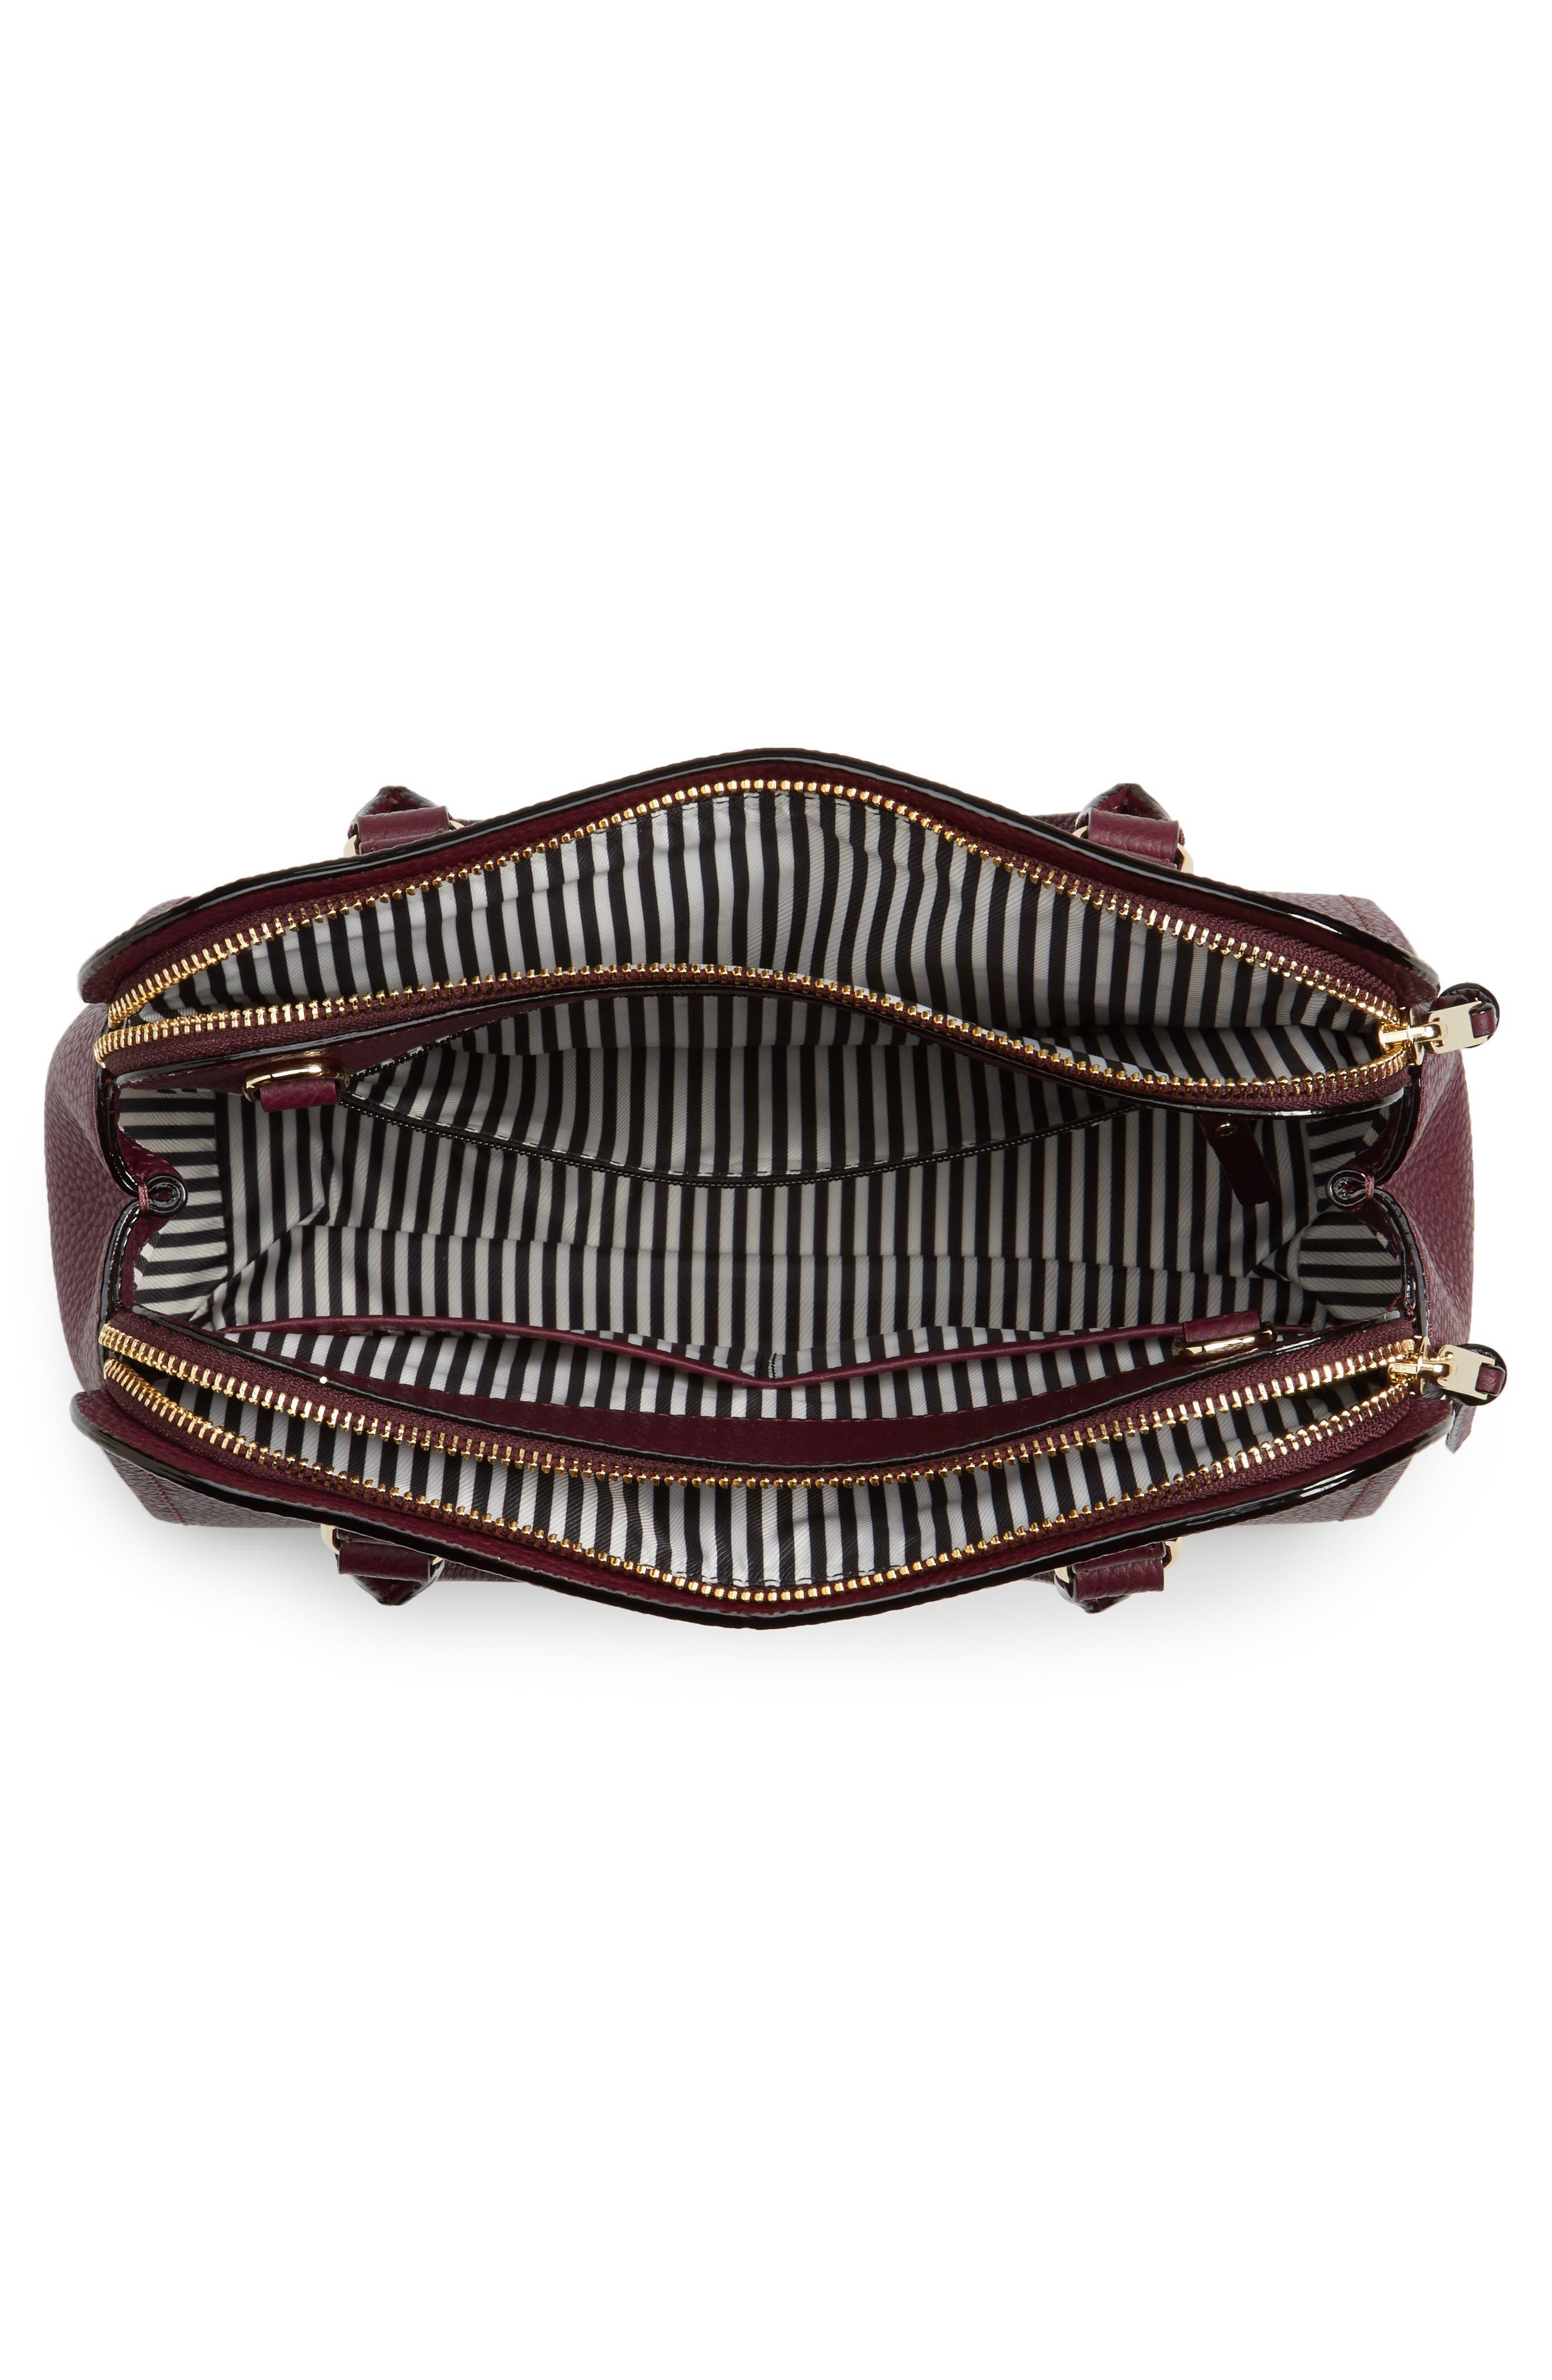 jackson street small kiernan leather top handle satchel,                             Alternate thumbnail 4, color,                             545